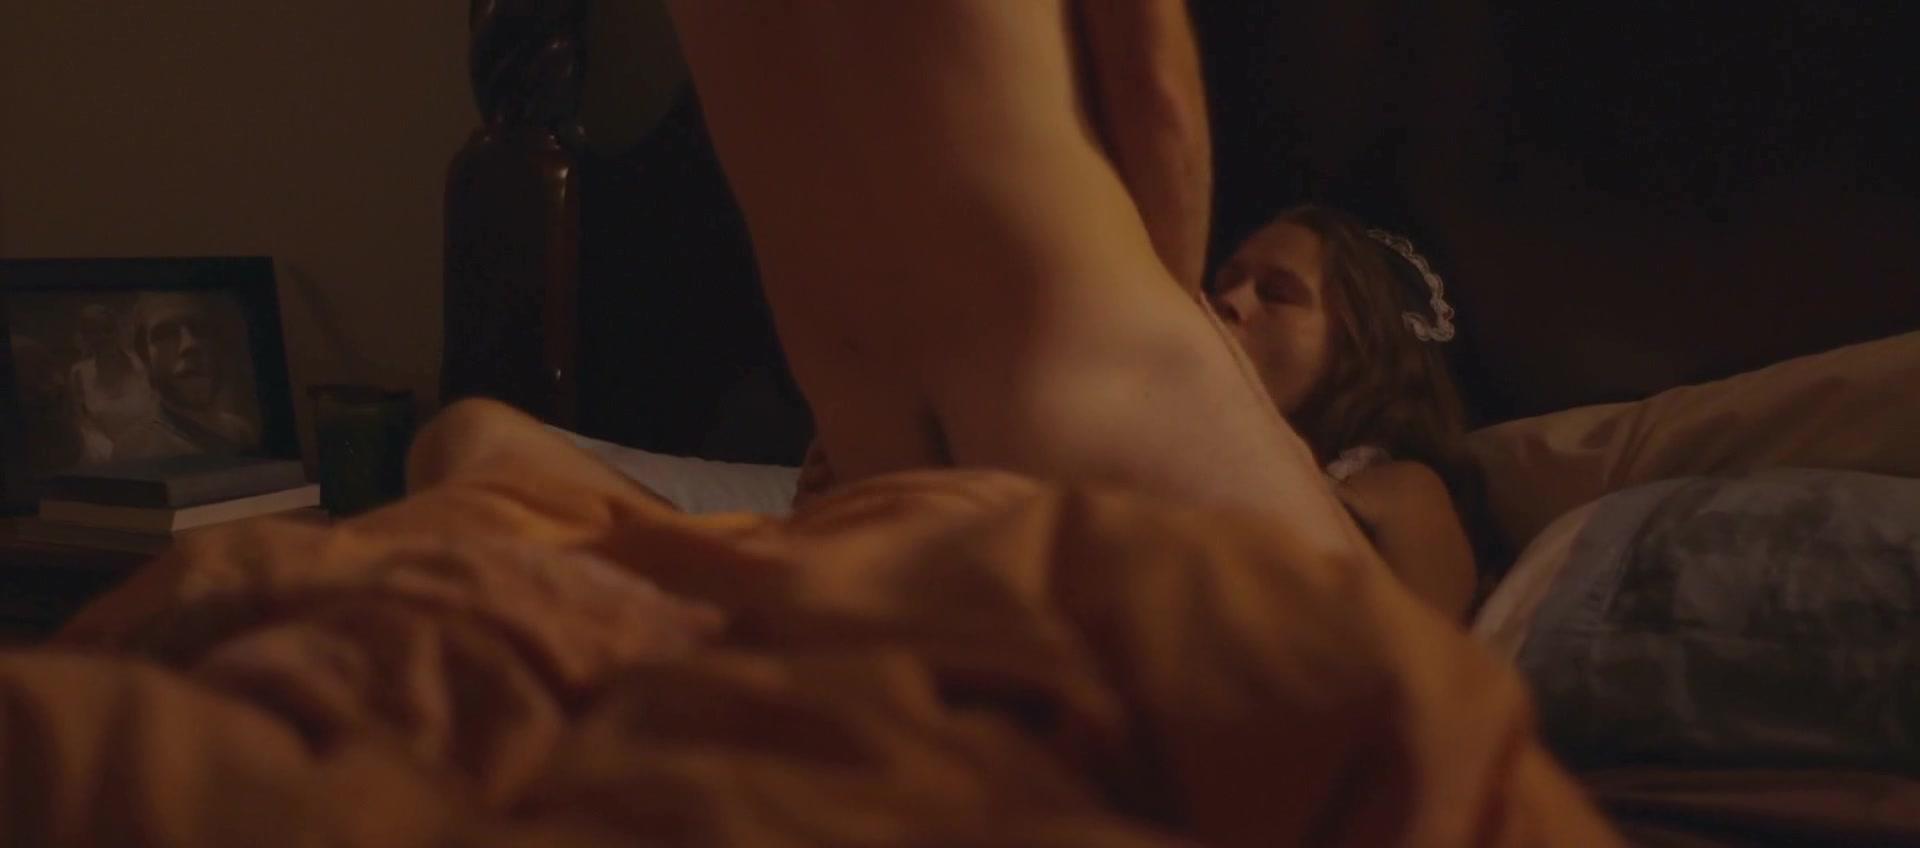 belle delphine nudes leaked